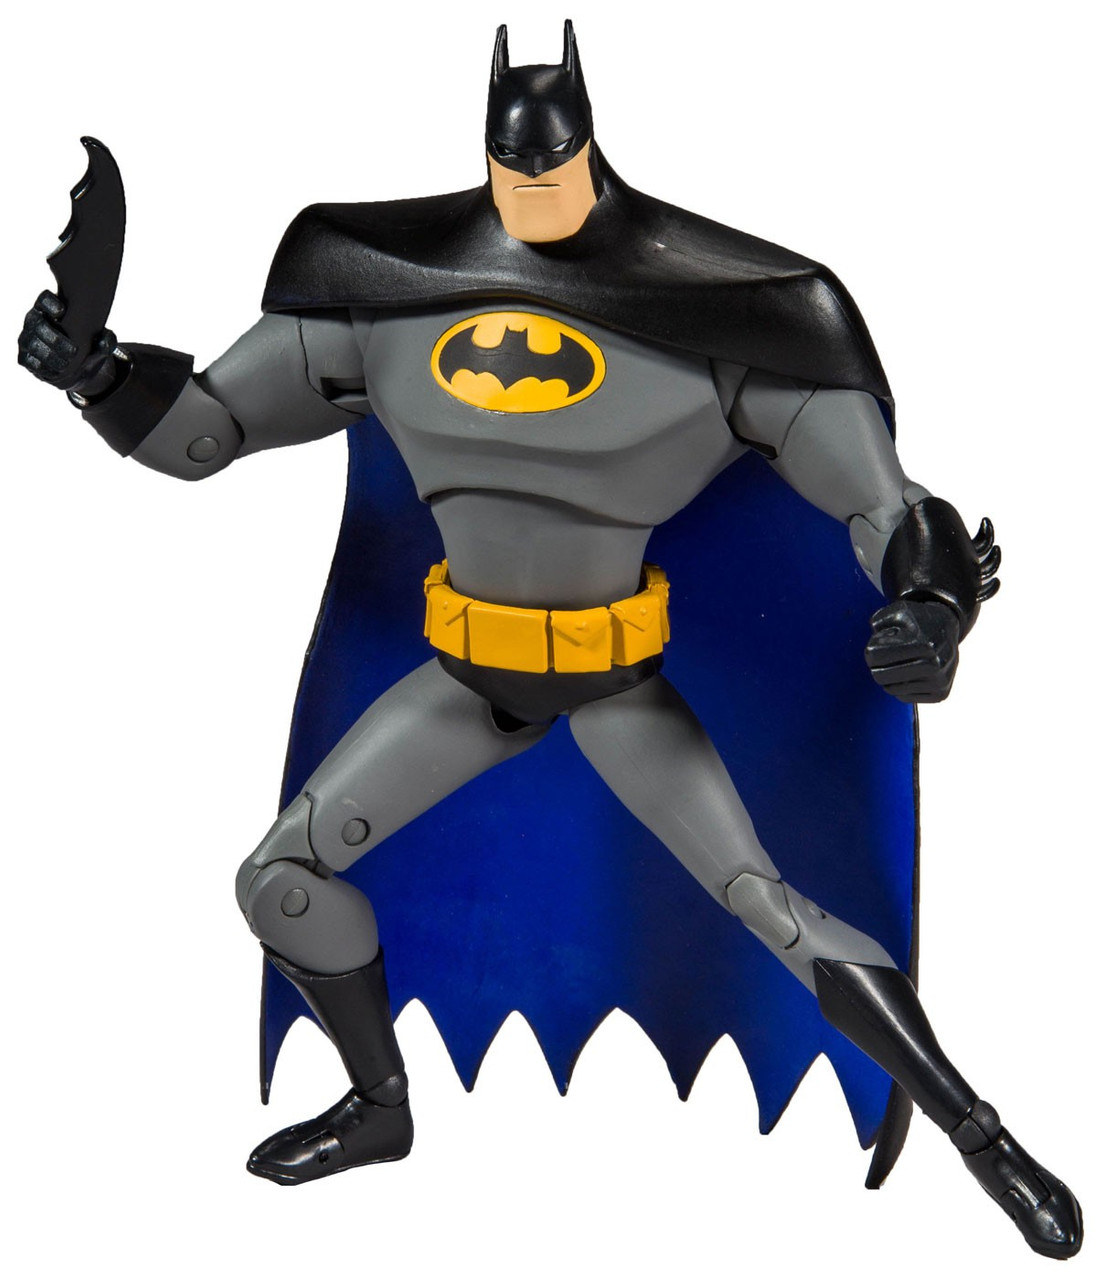 PRE ORDER McFarlane Toys DC Rebirth Figura Build A Batgirl 18 Art of the Crime